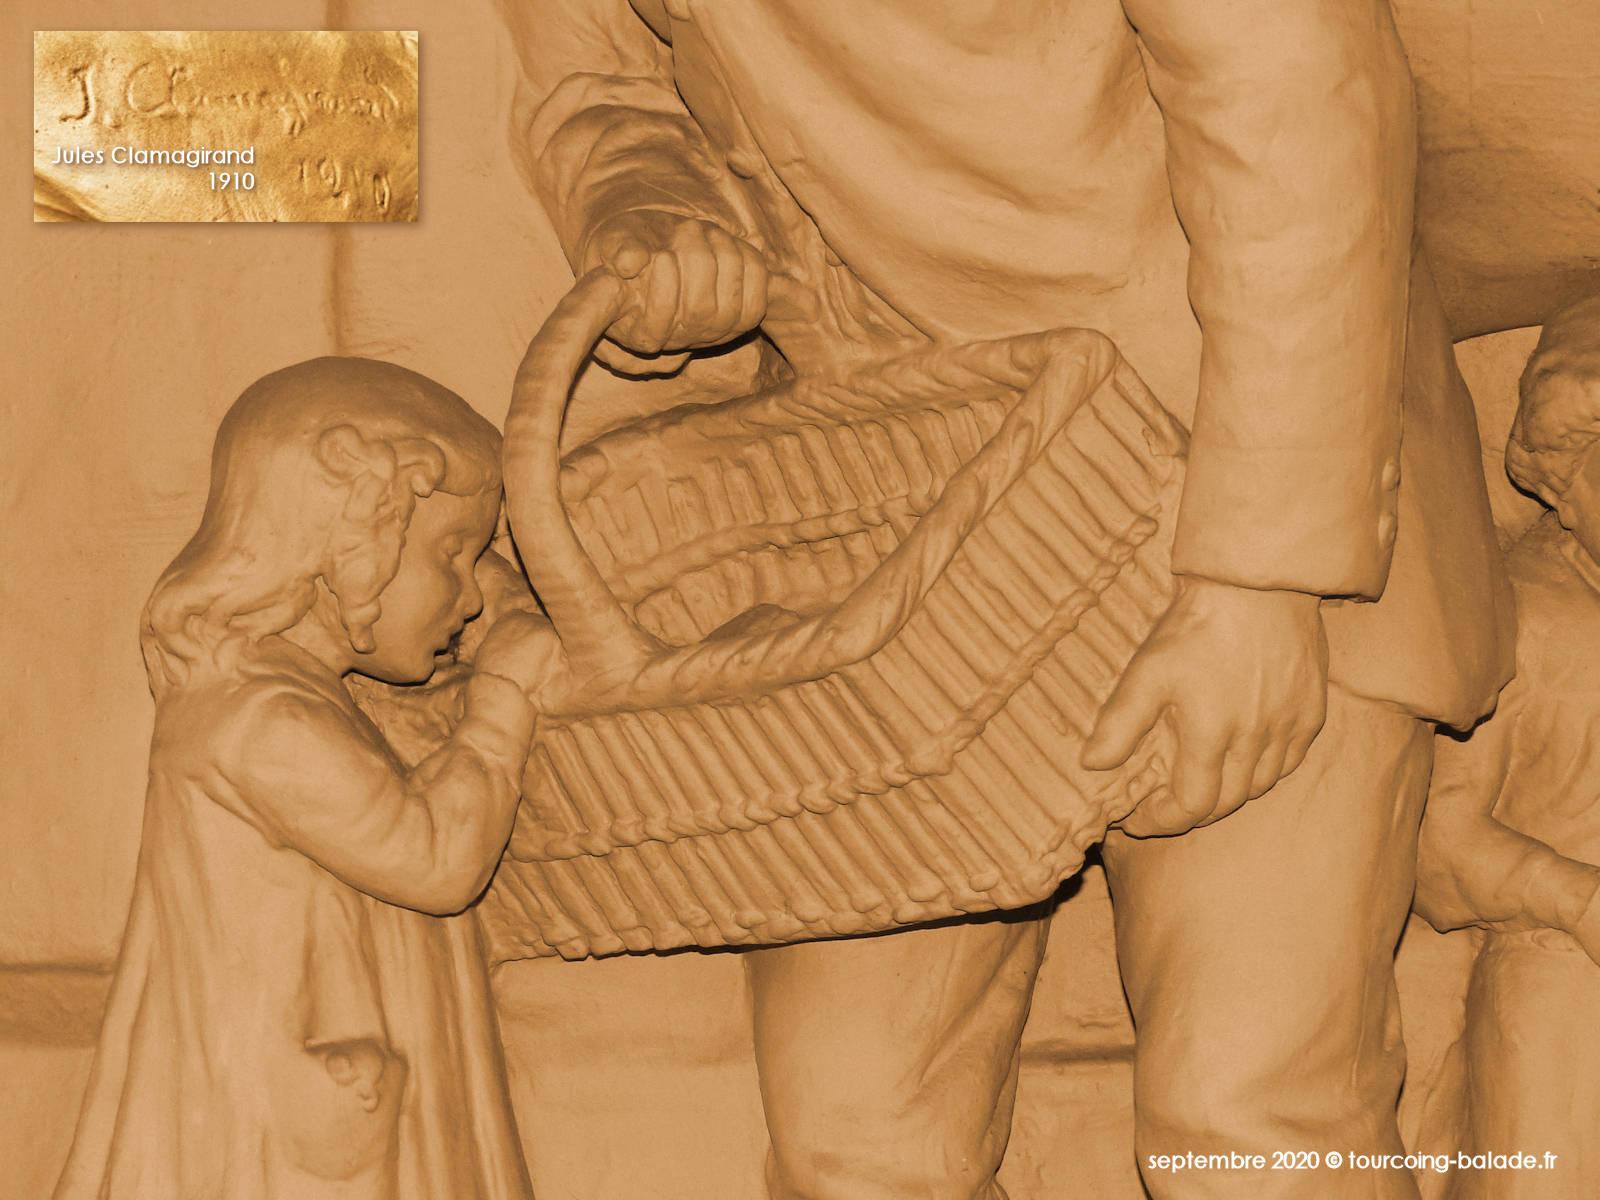 Sculpture Jules Clamagirand, Tourcoing 1910.